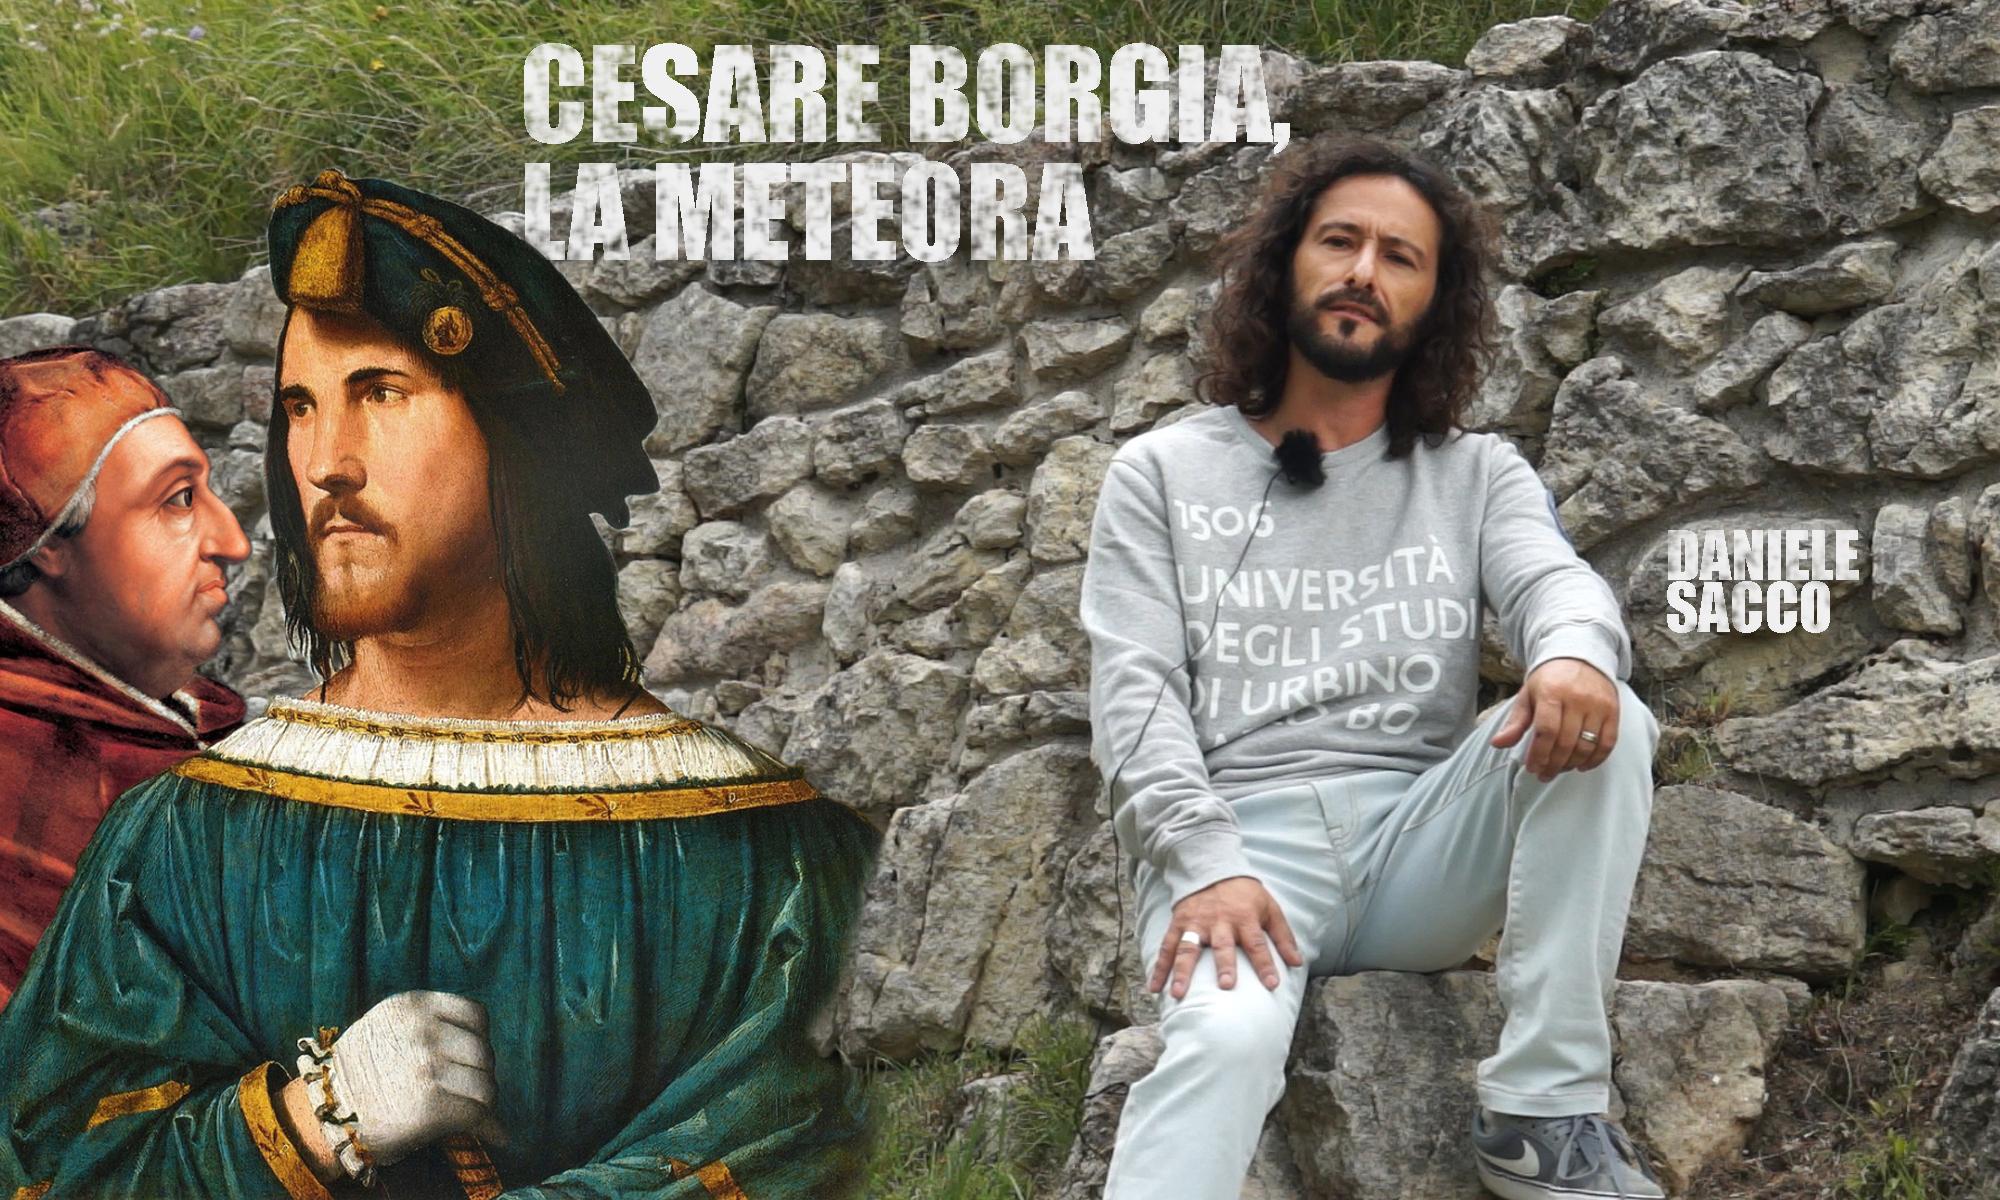 Cesare Borgia, la meteora